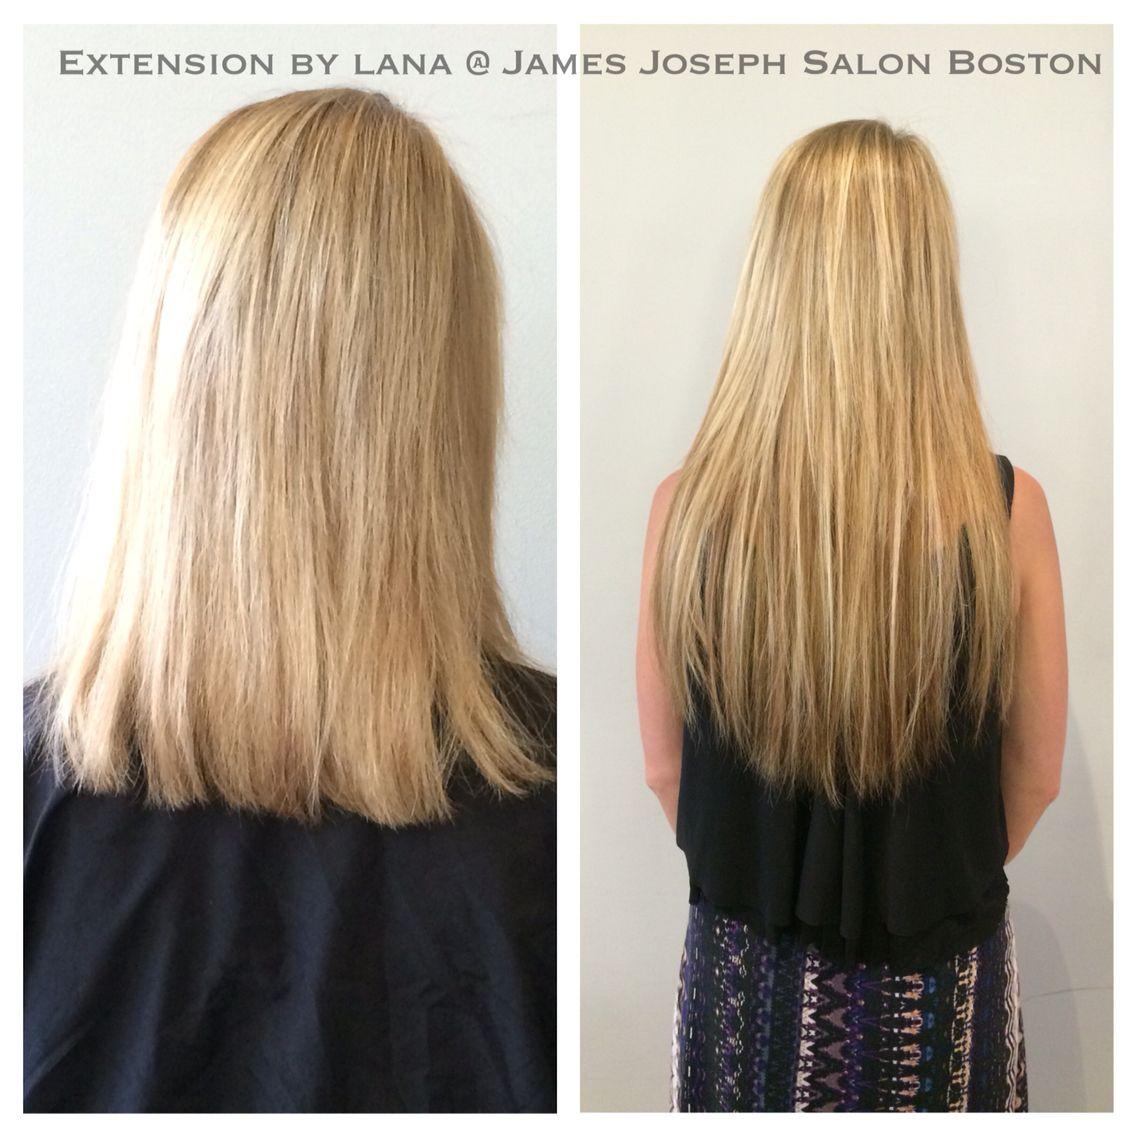 Bonded Extensions By Lana James Joseph Salon Newbury St Boston